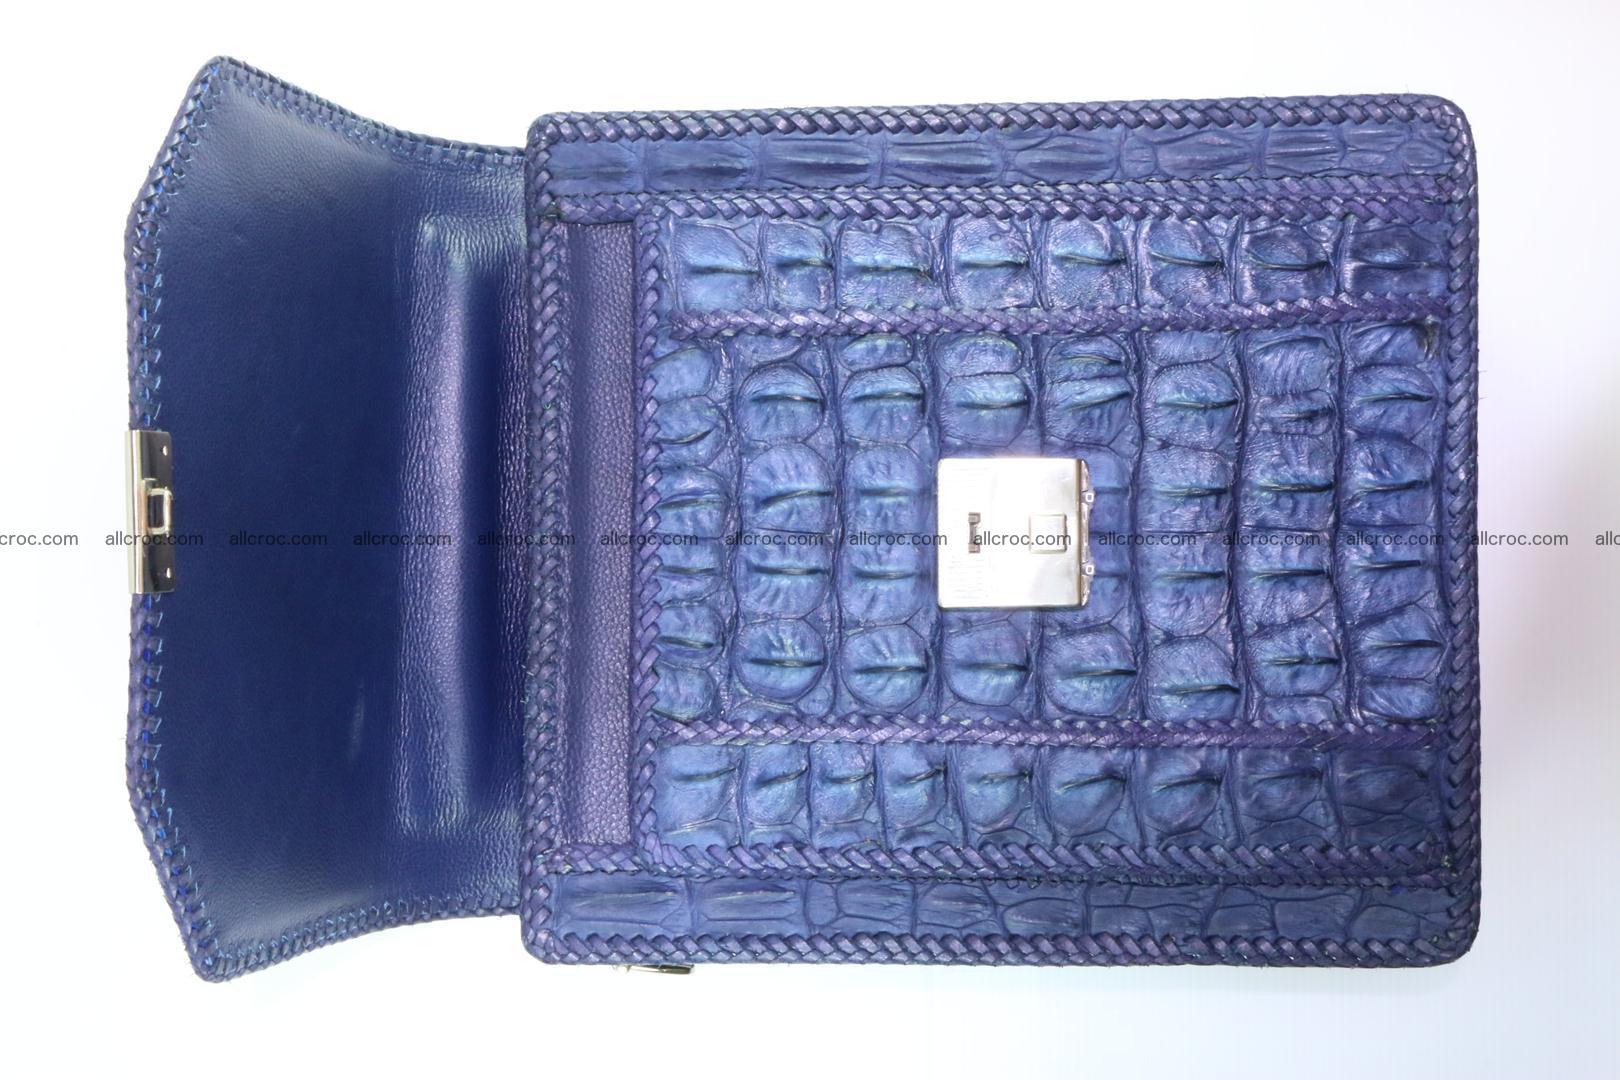 Crocodile skin messenger bag braided edges 419 Foto 9